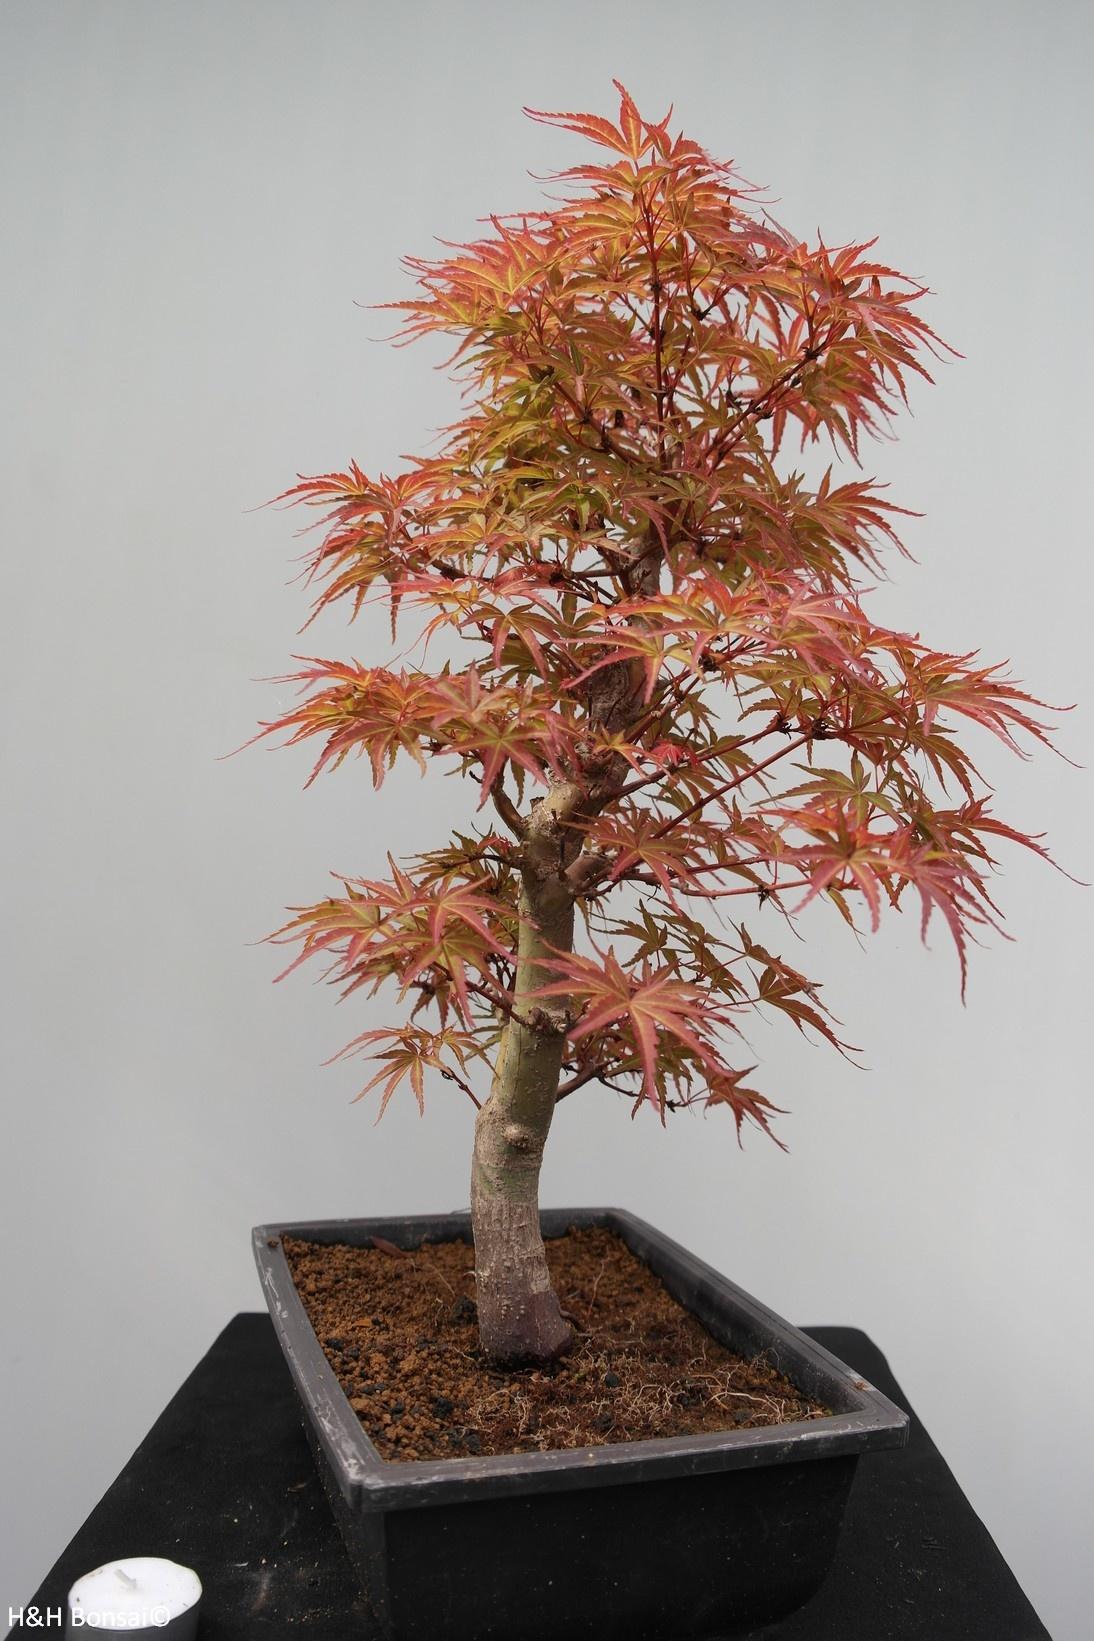 Bonsai Japanese Maple, Acer palmatum, no. 7753